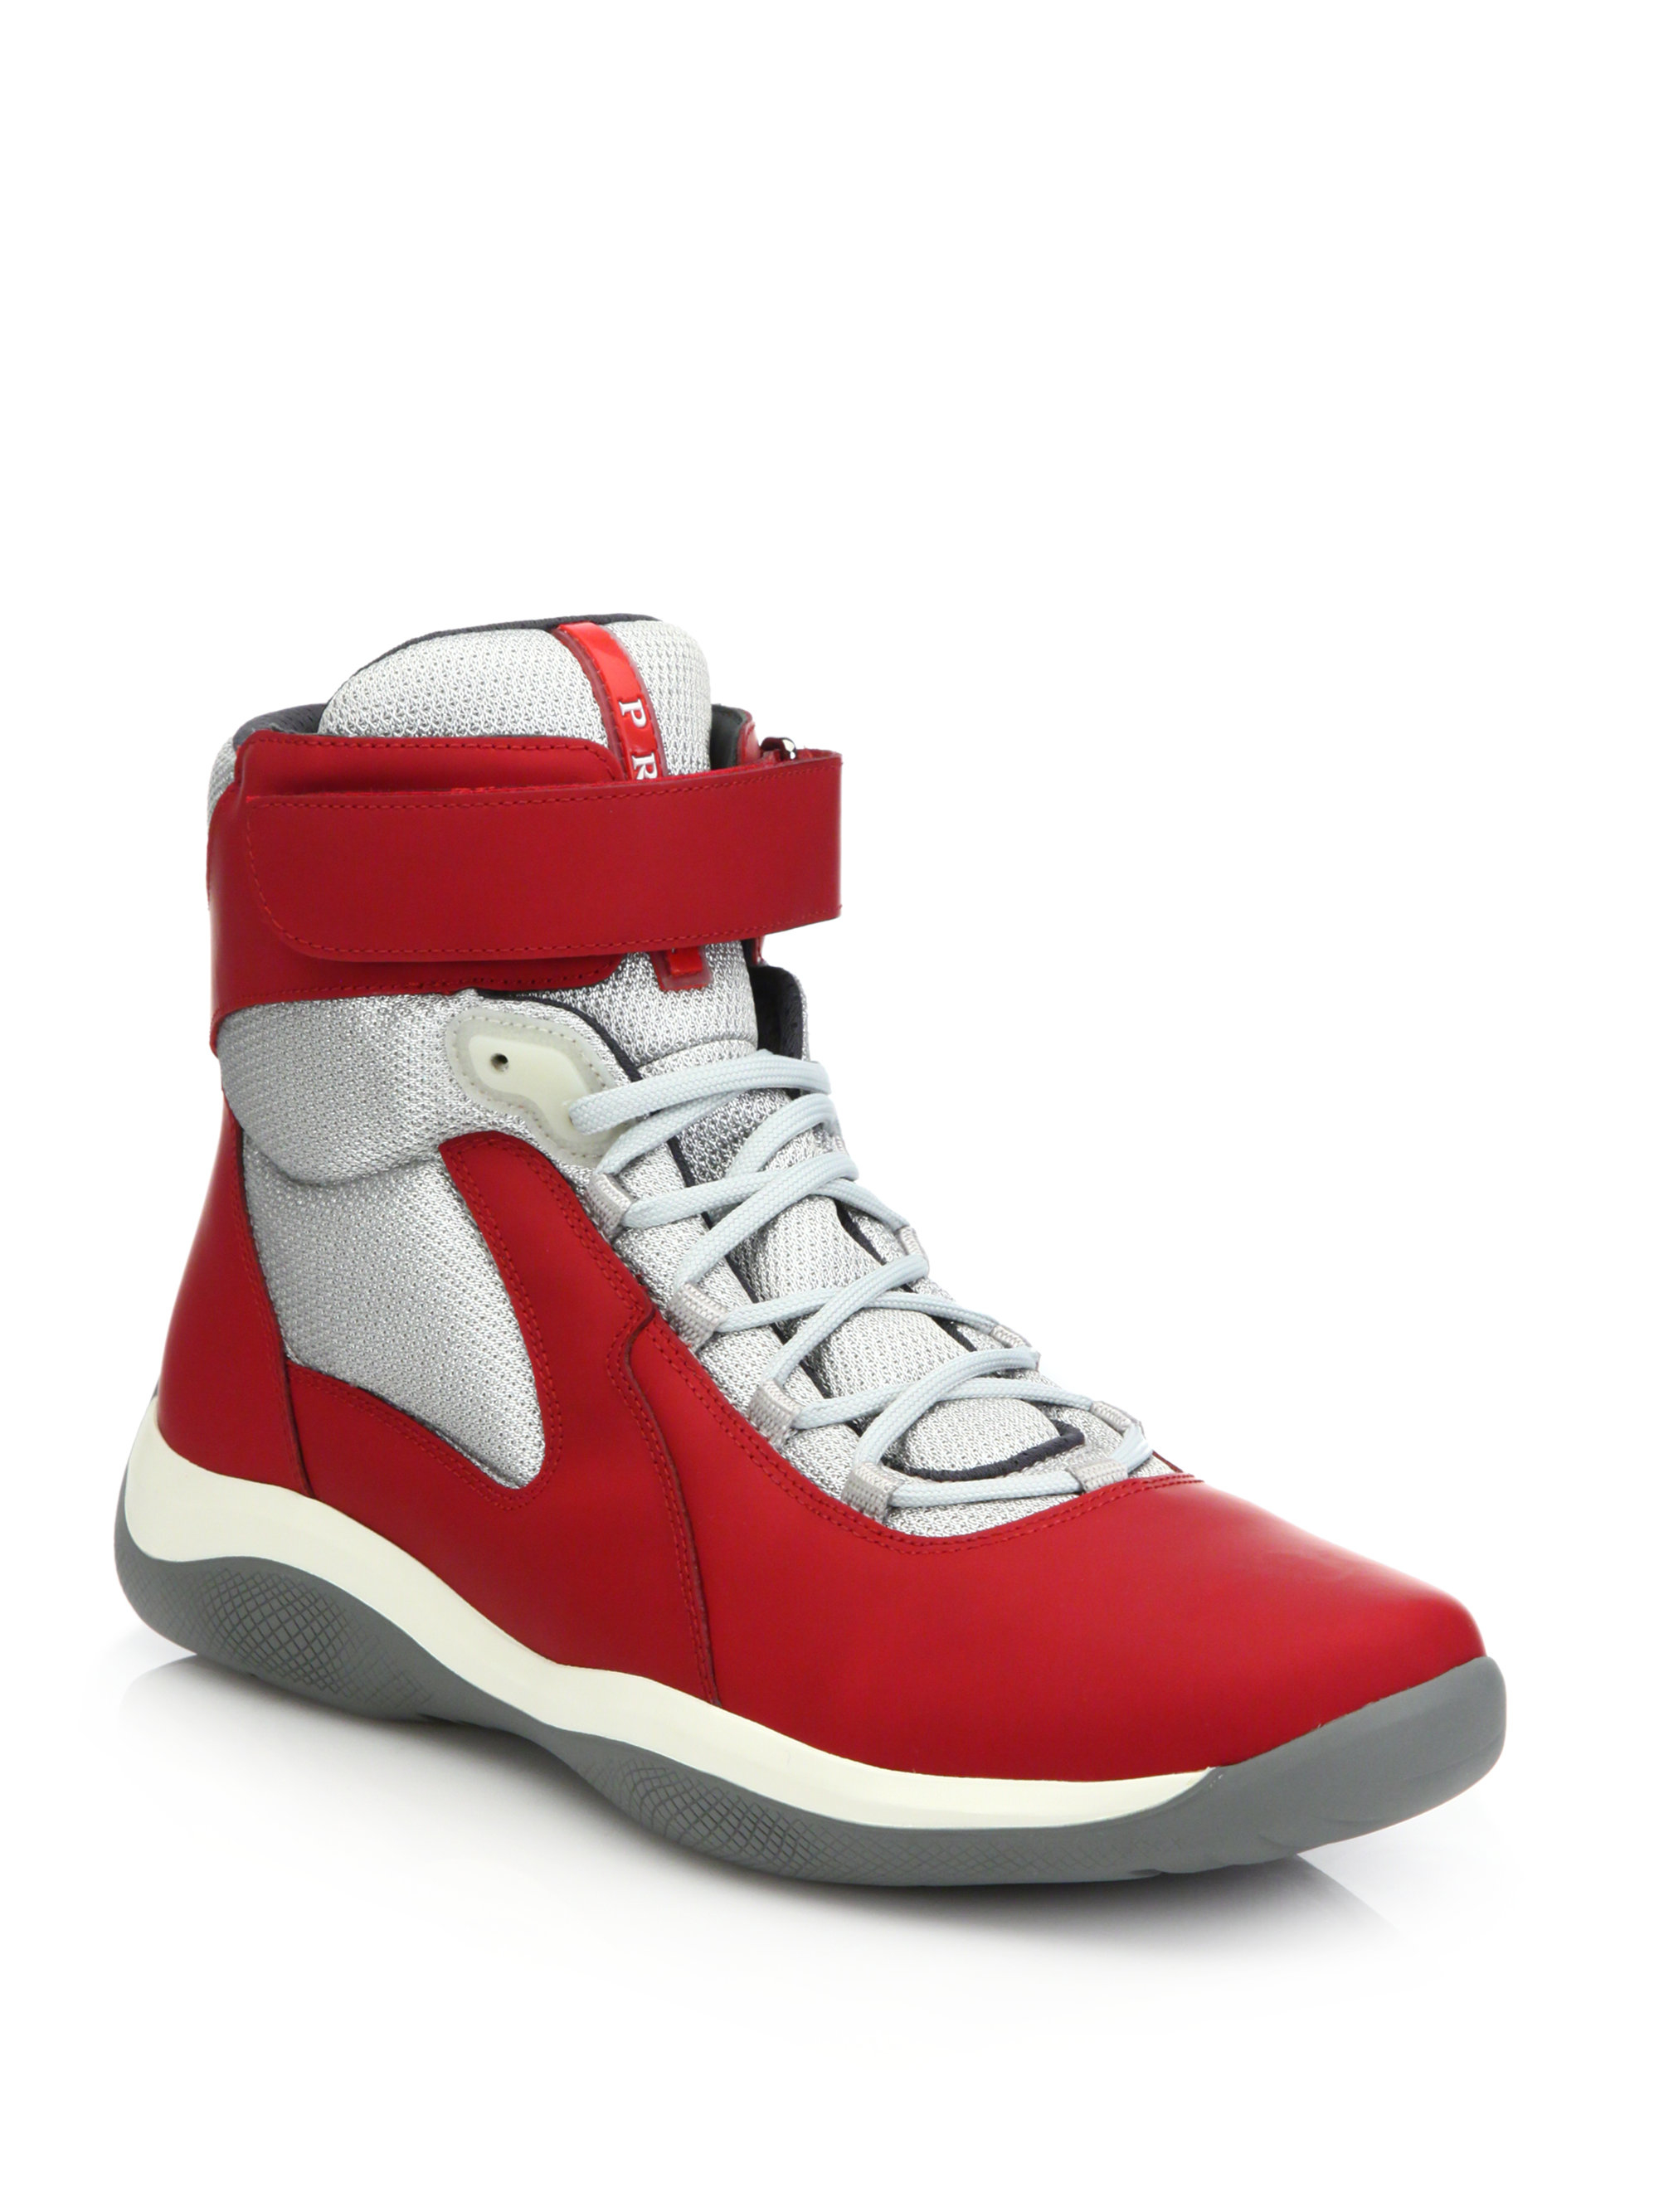 Prada Velcro Strap High Top Sneakers In Red For Men Lyst